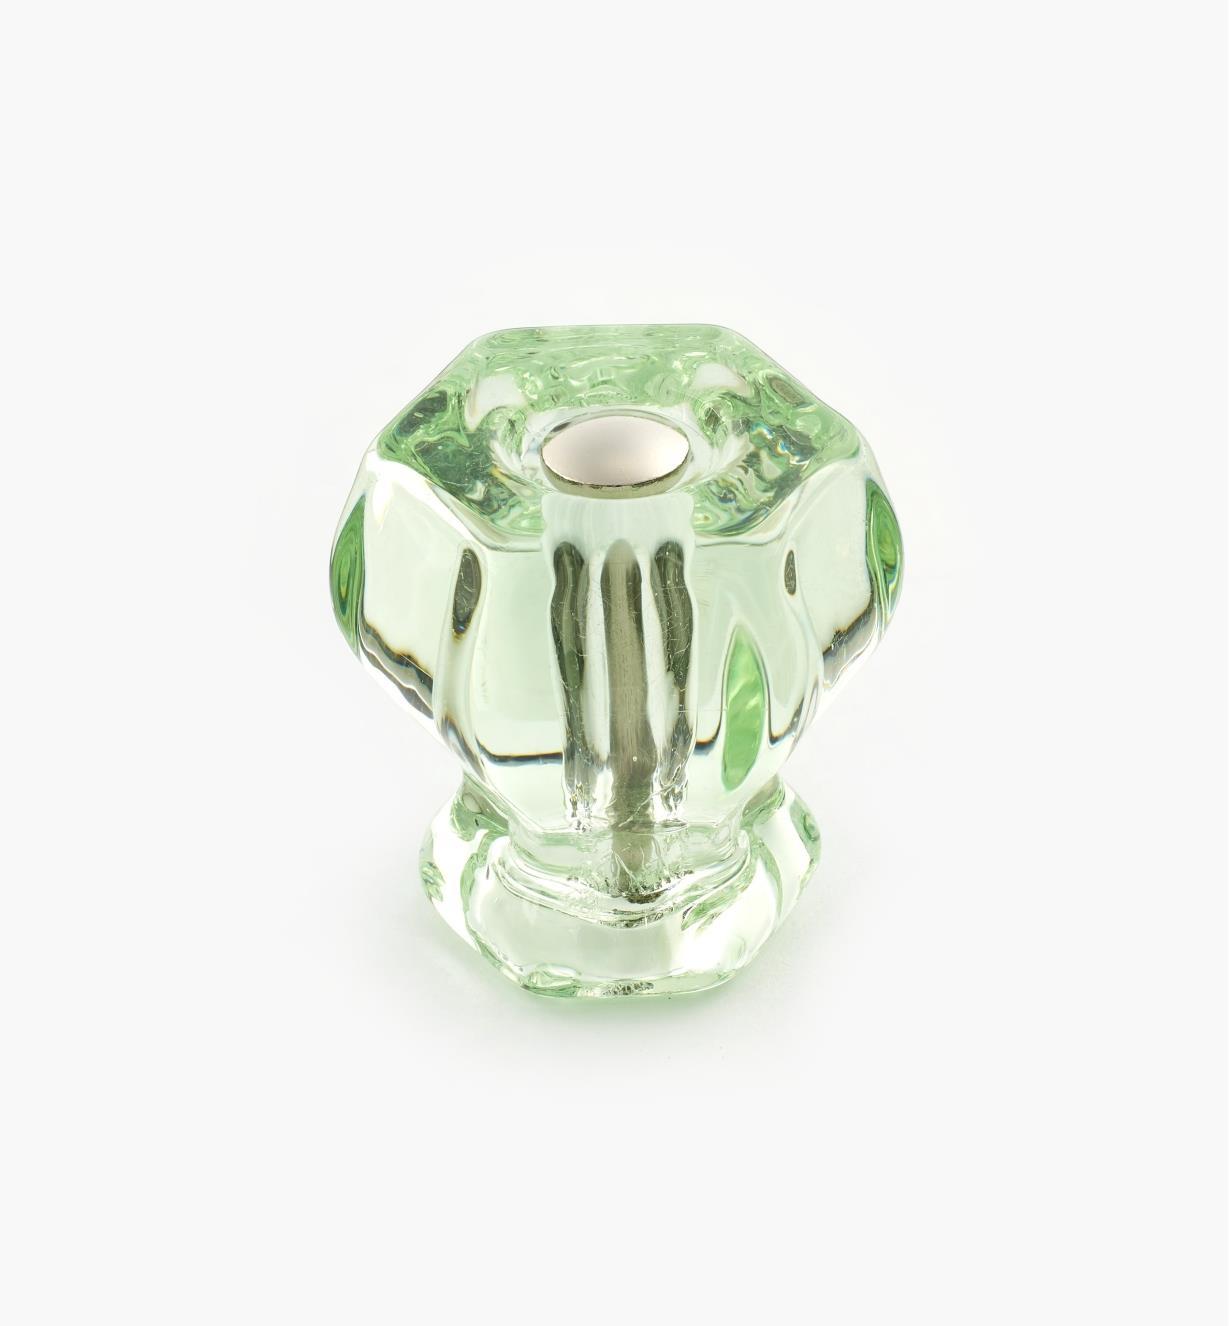 01A3750 - Bouton hexagonal en verre, vertpâle, 11/8po